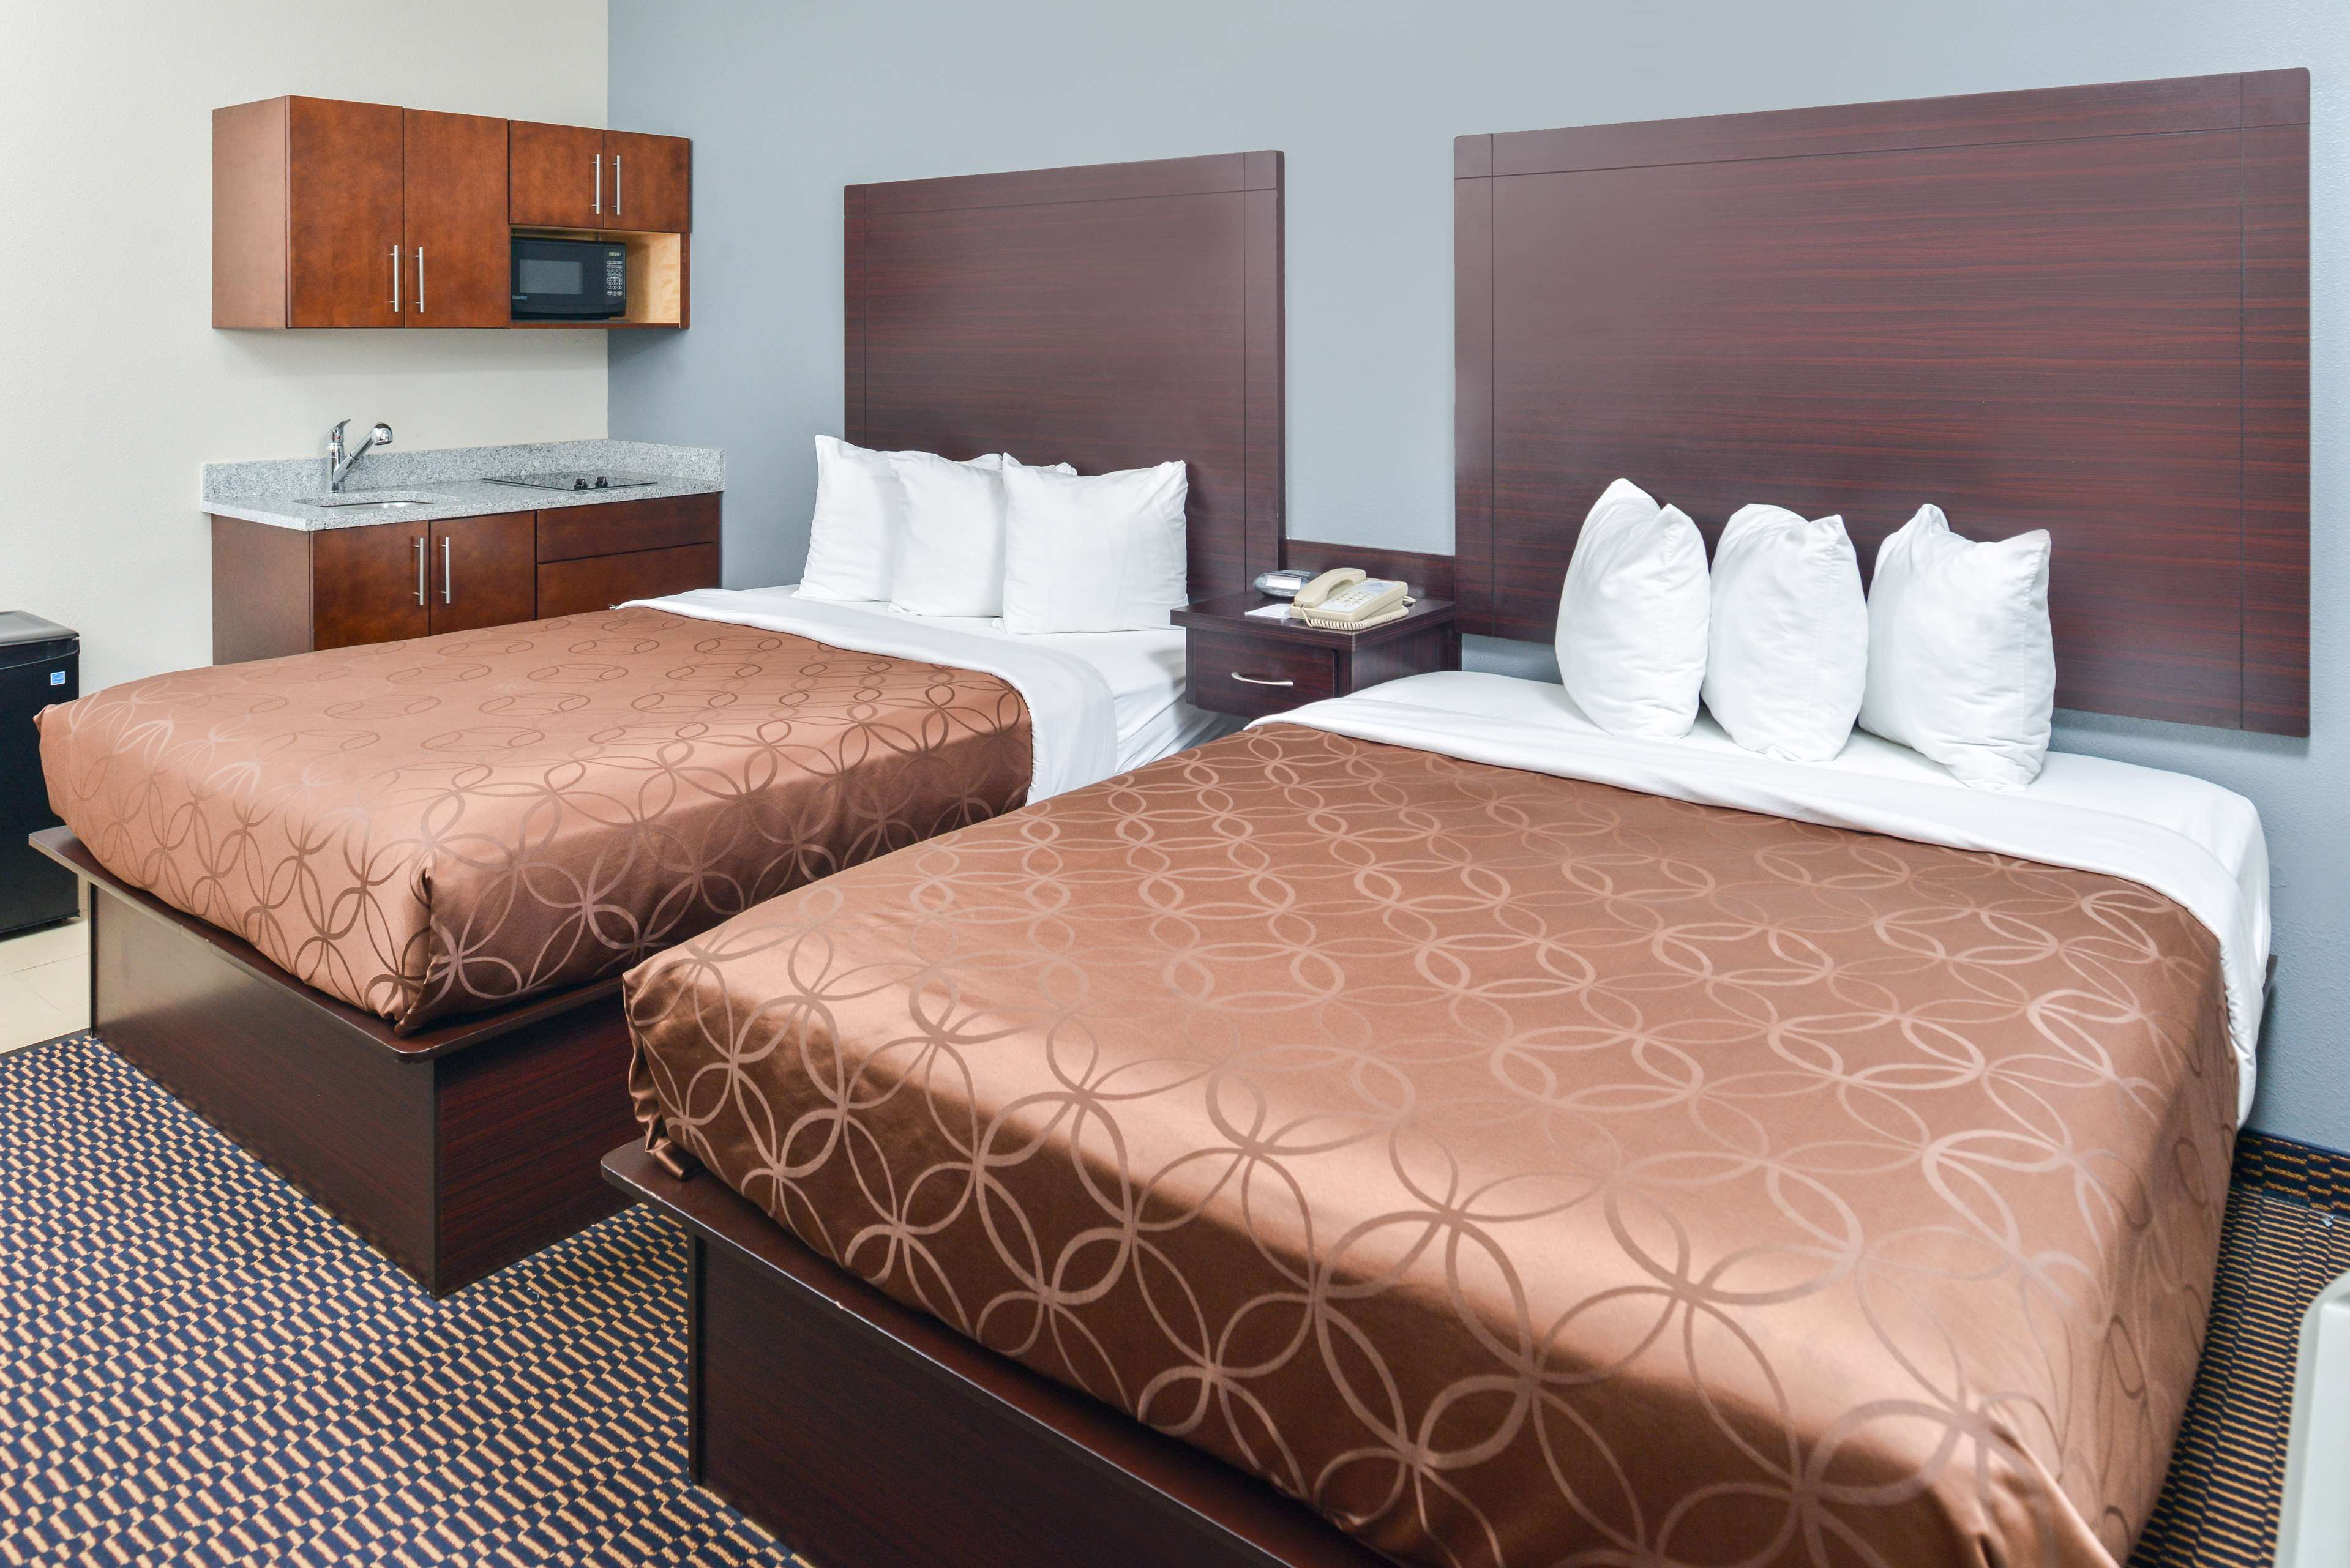 Americas Best Value Inn - Baton Rouge / College Drive image 10